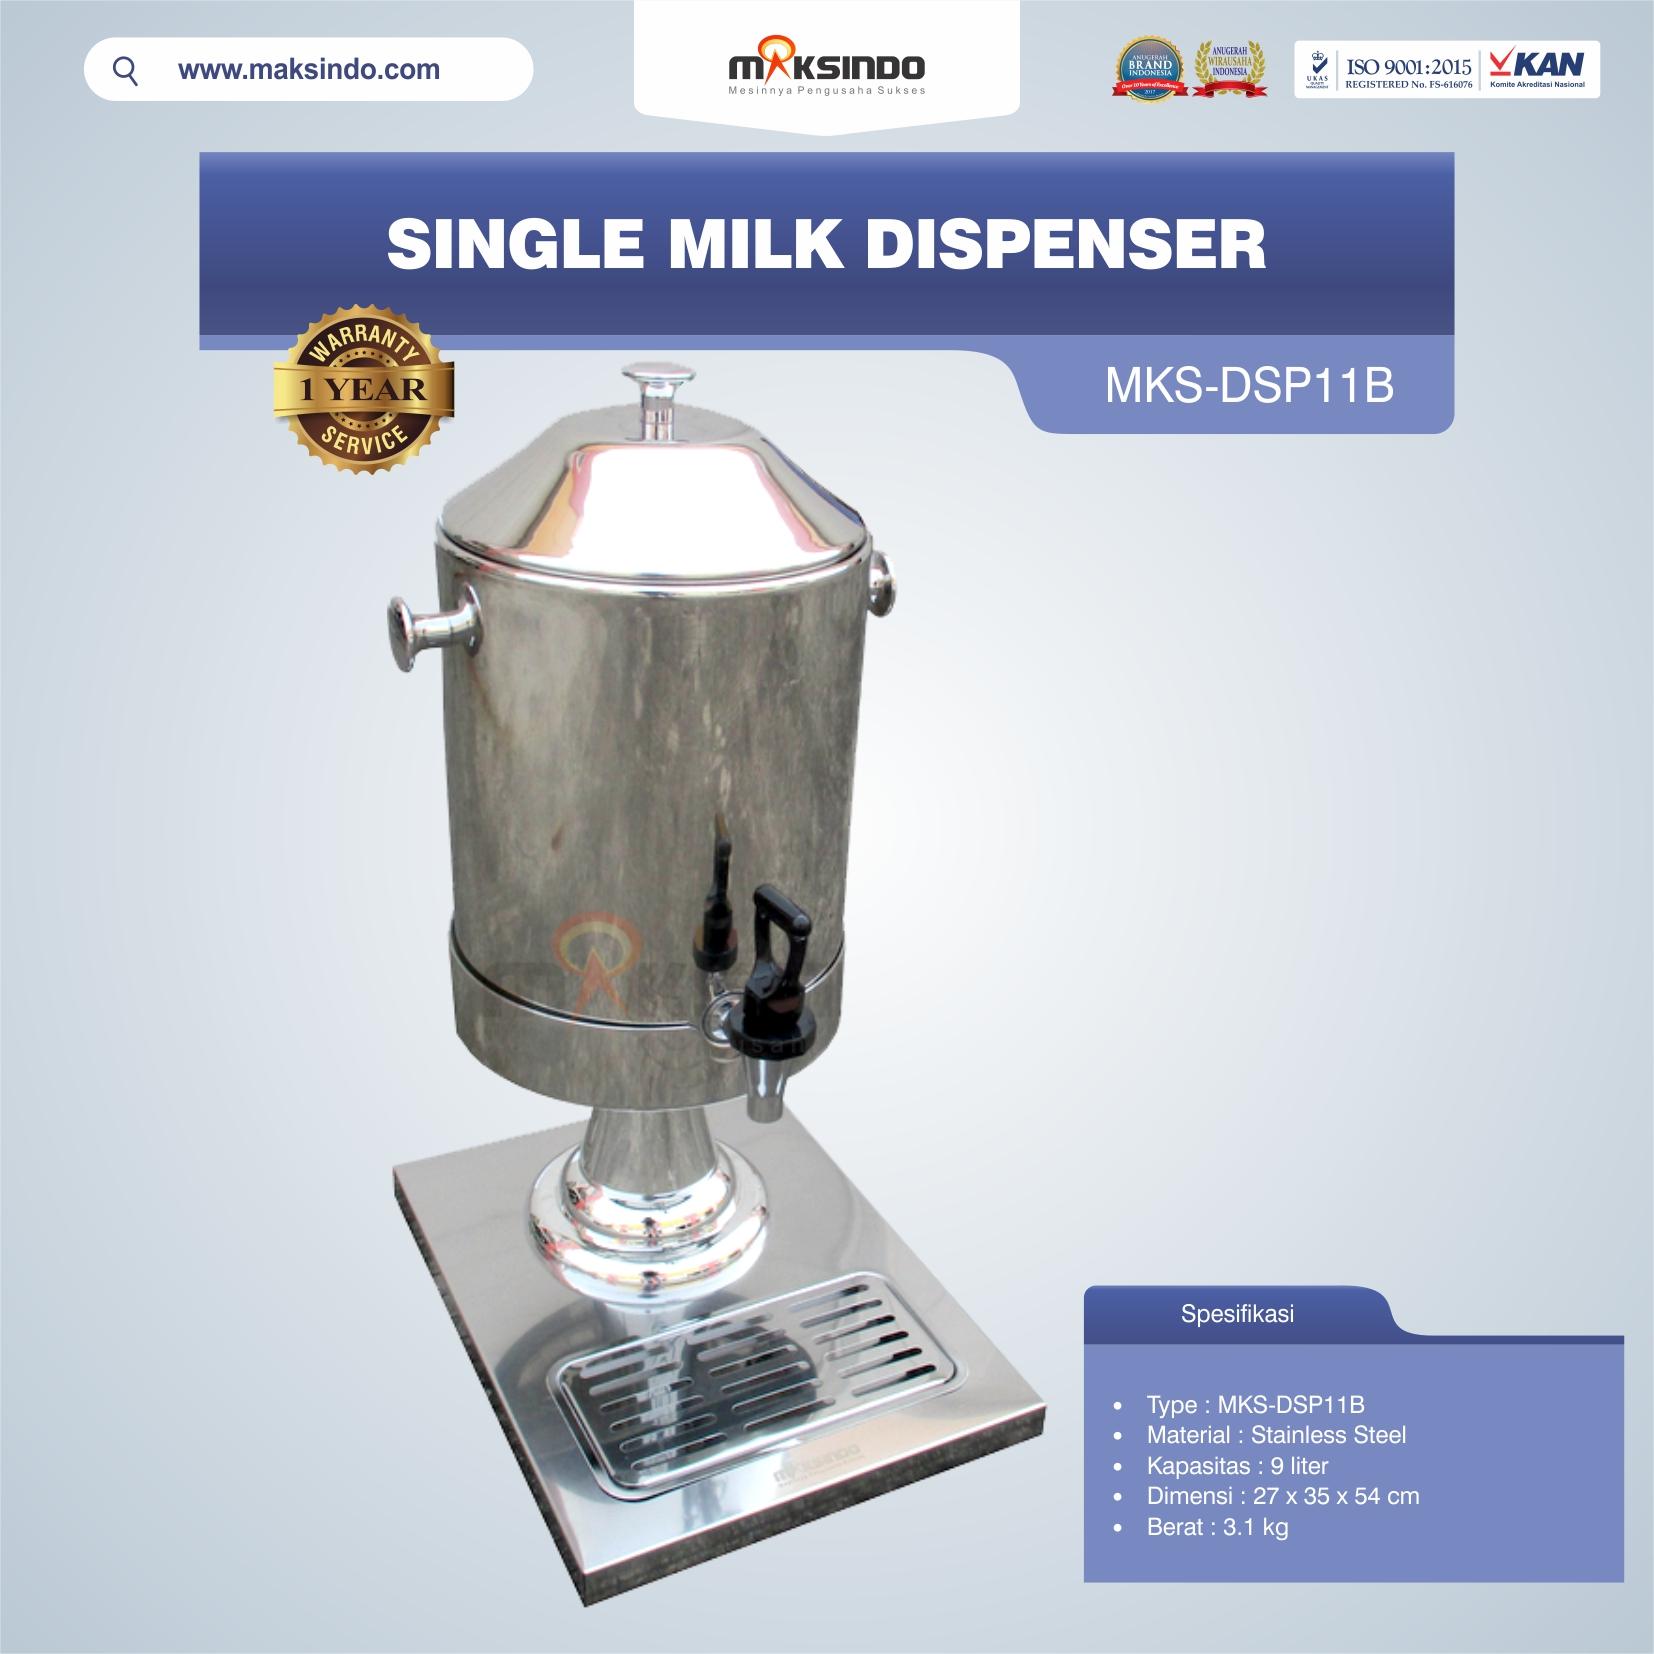 Jual Single Milk Dispenser MKS-DSP11B di Mataram